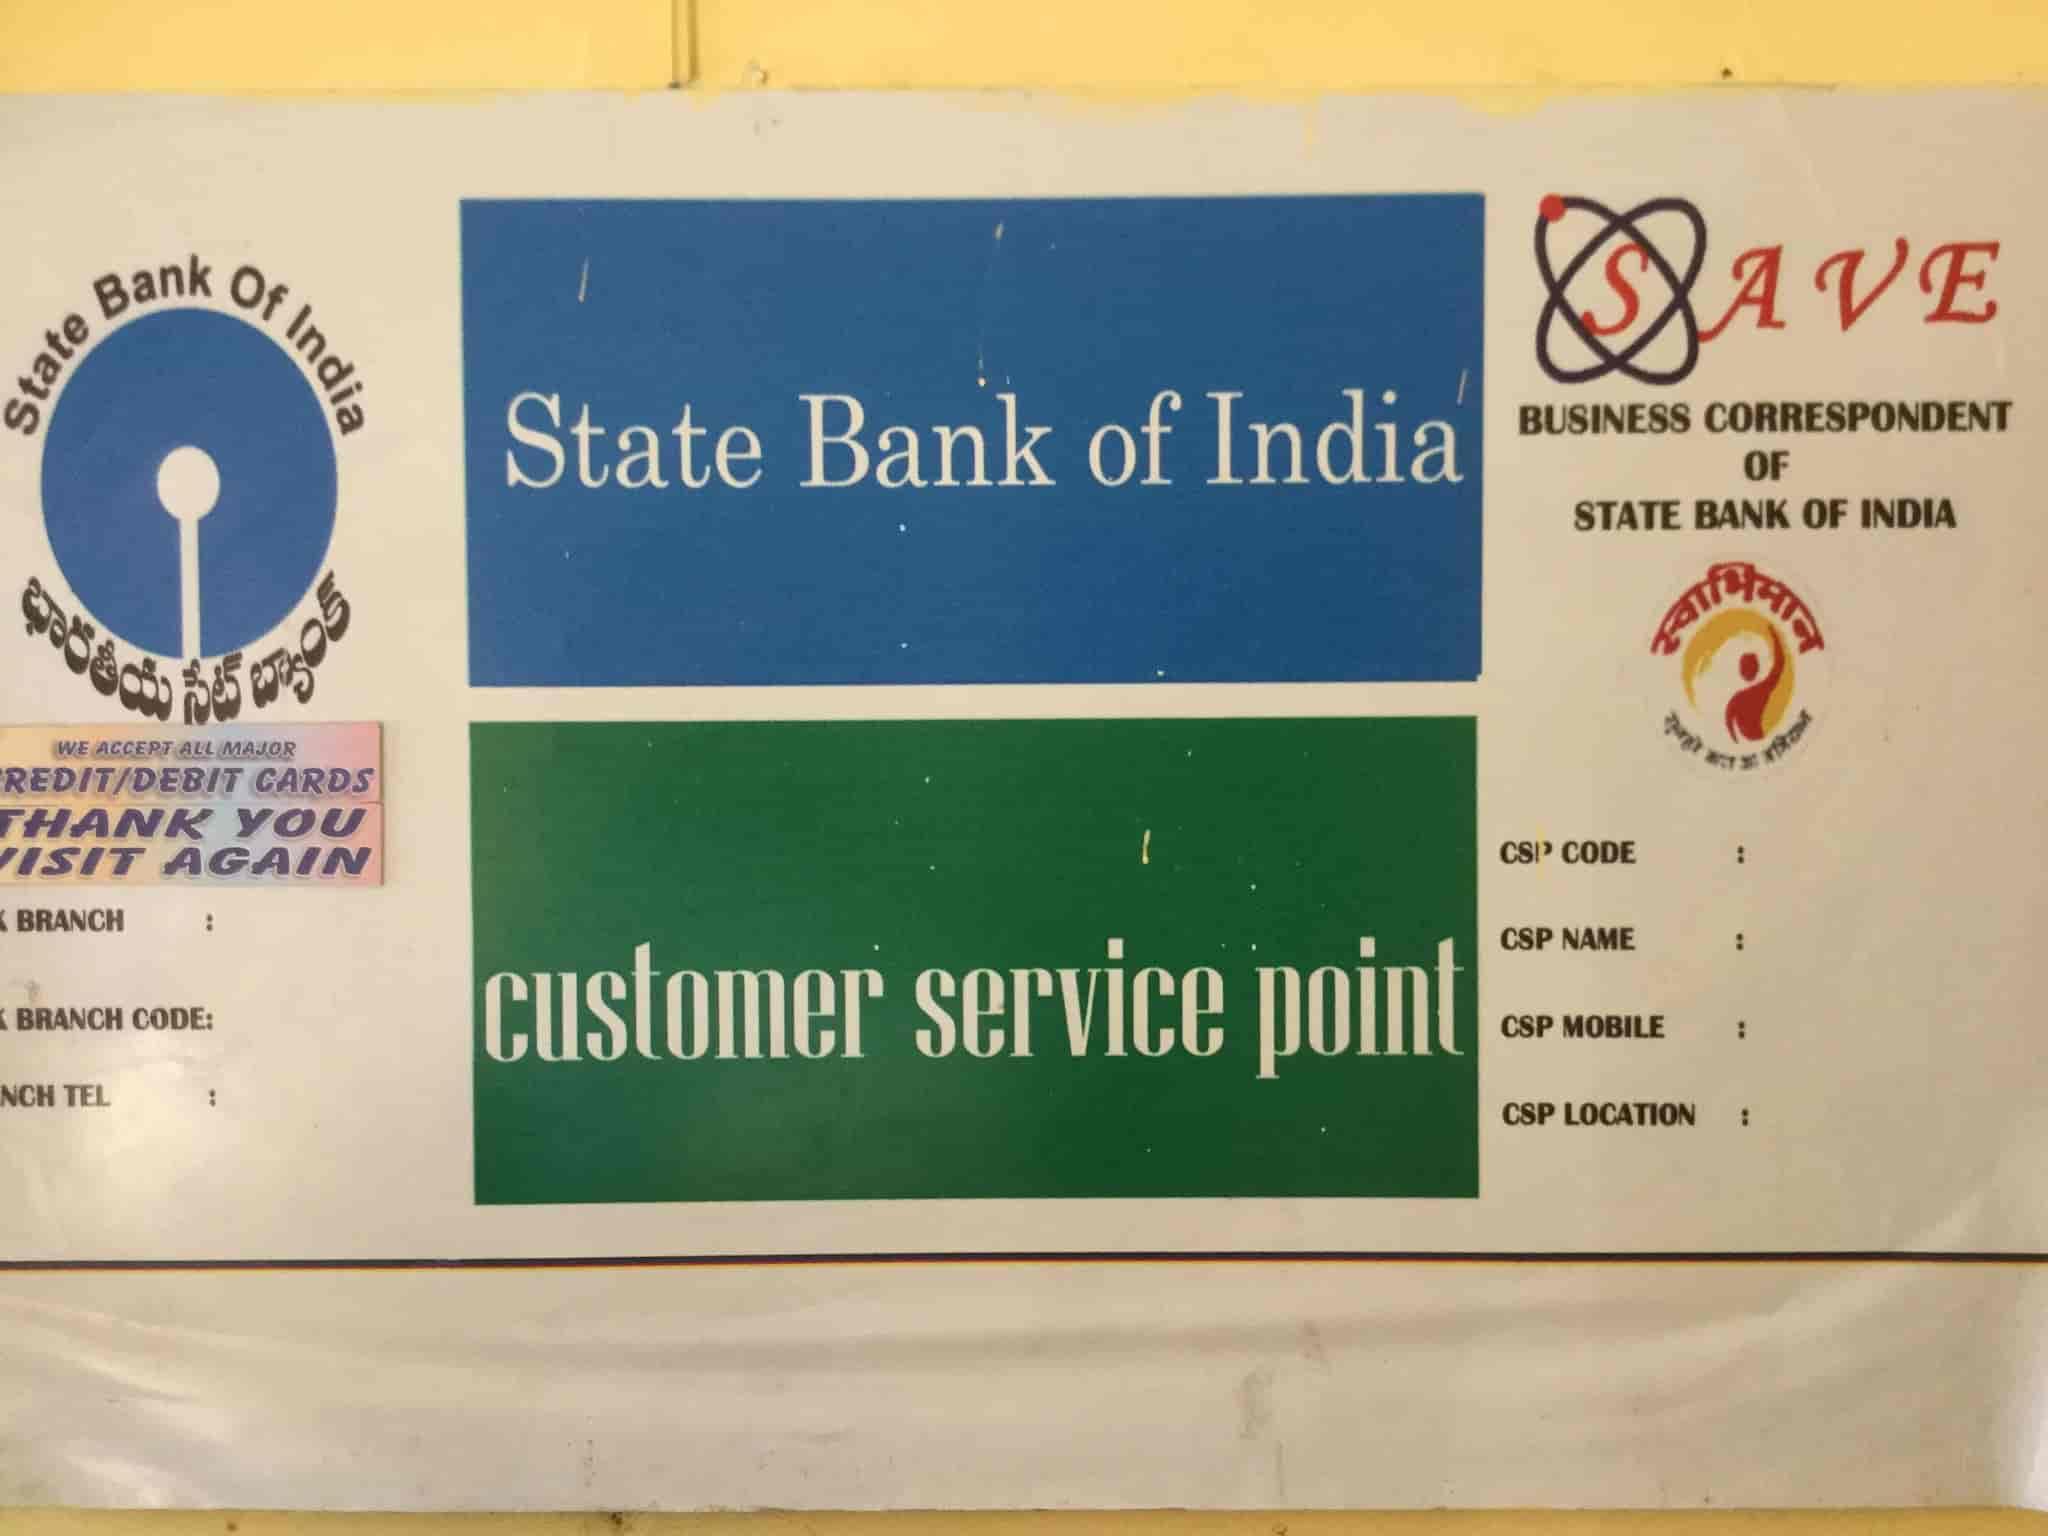 SBI Customer Service Point Photos, Malkajgiri, Hyderabad- Pictures